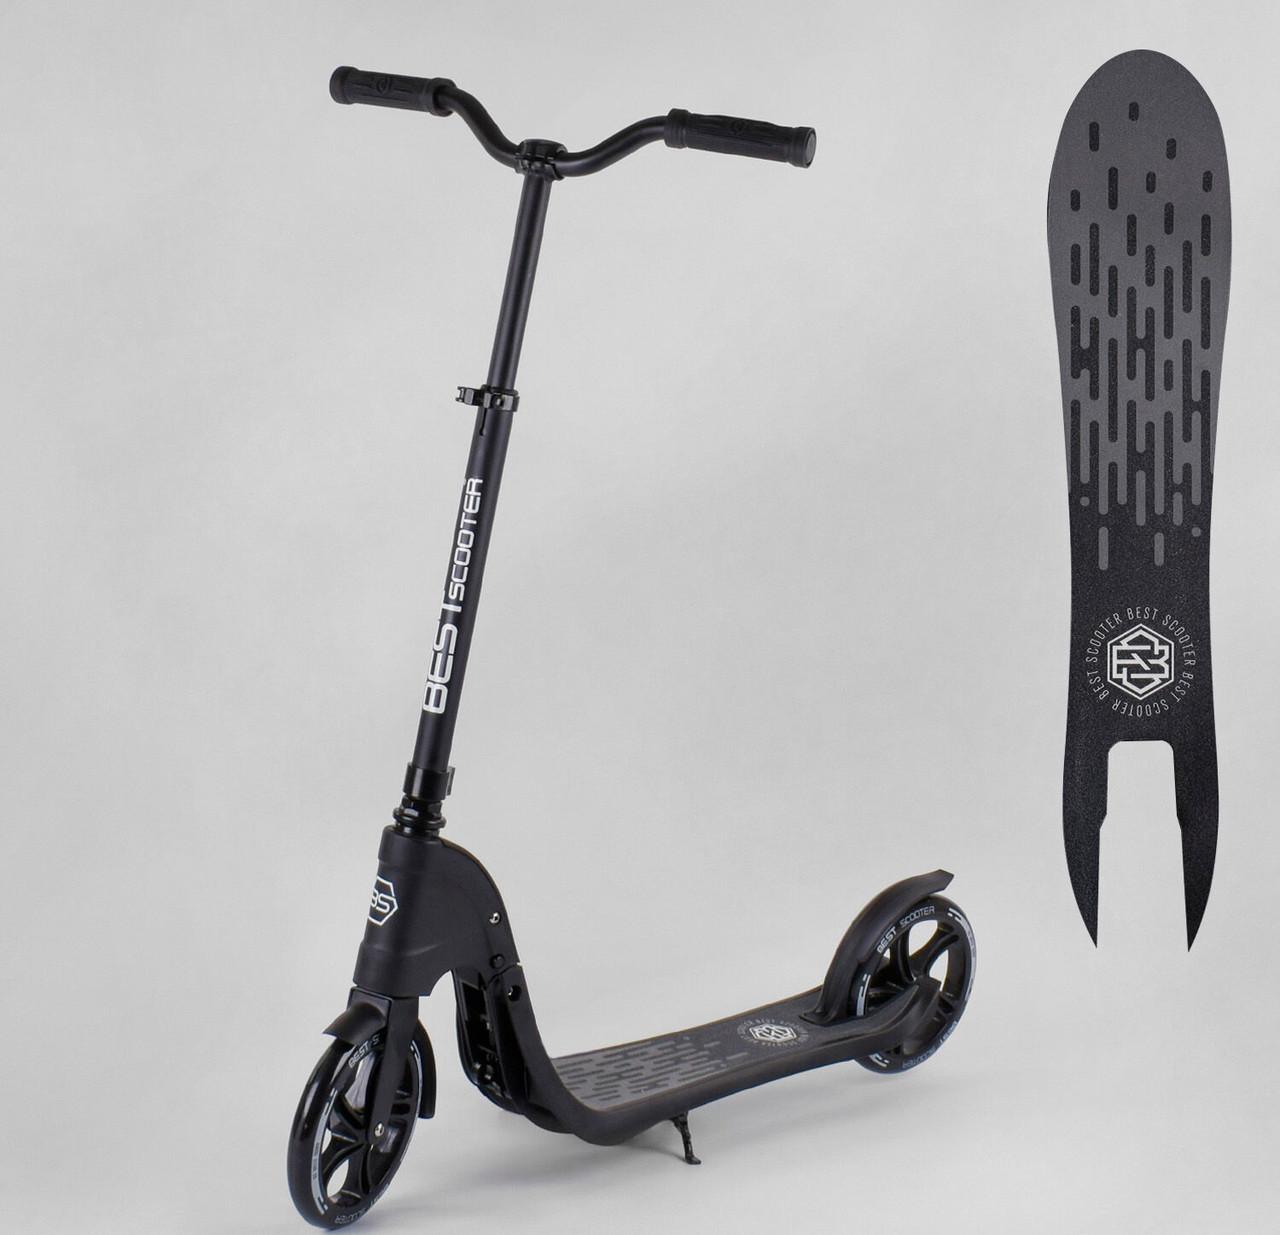 Міський Самокат Best Scooter складна конструкція